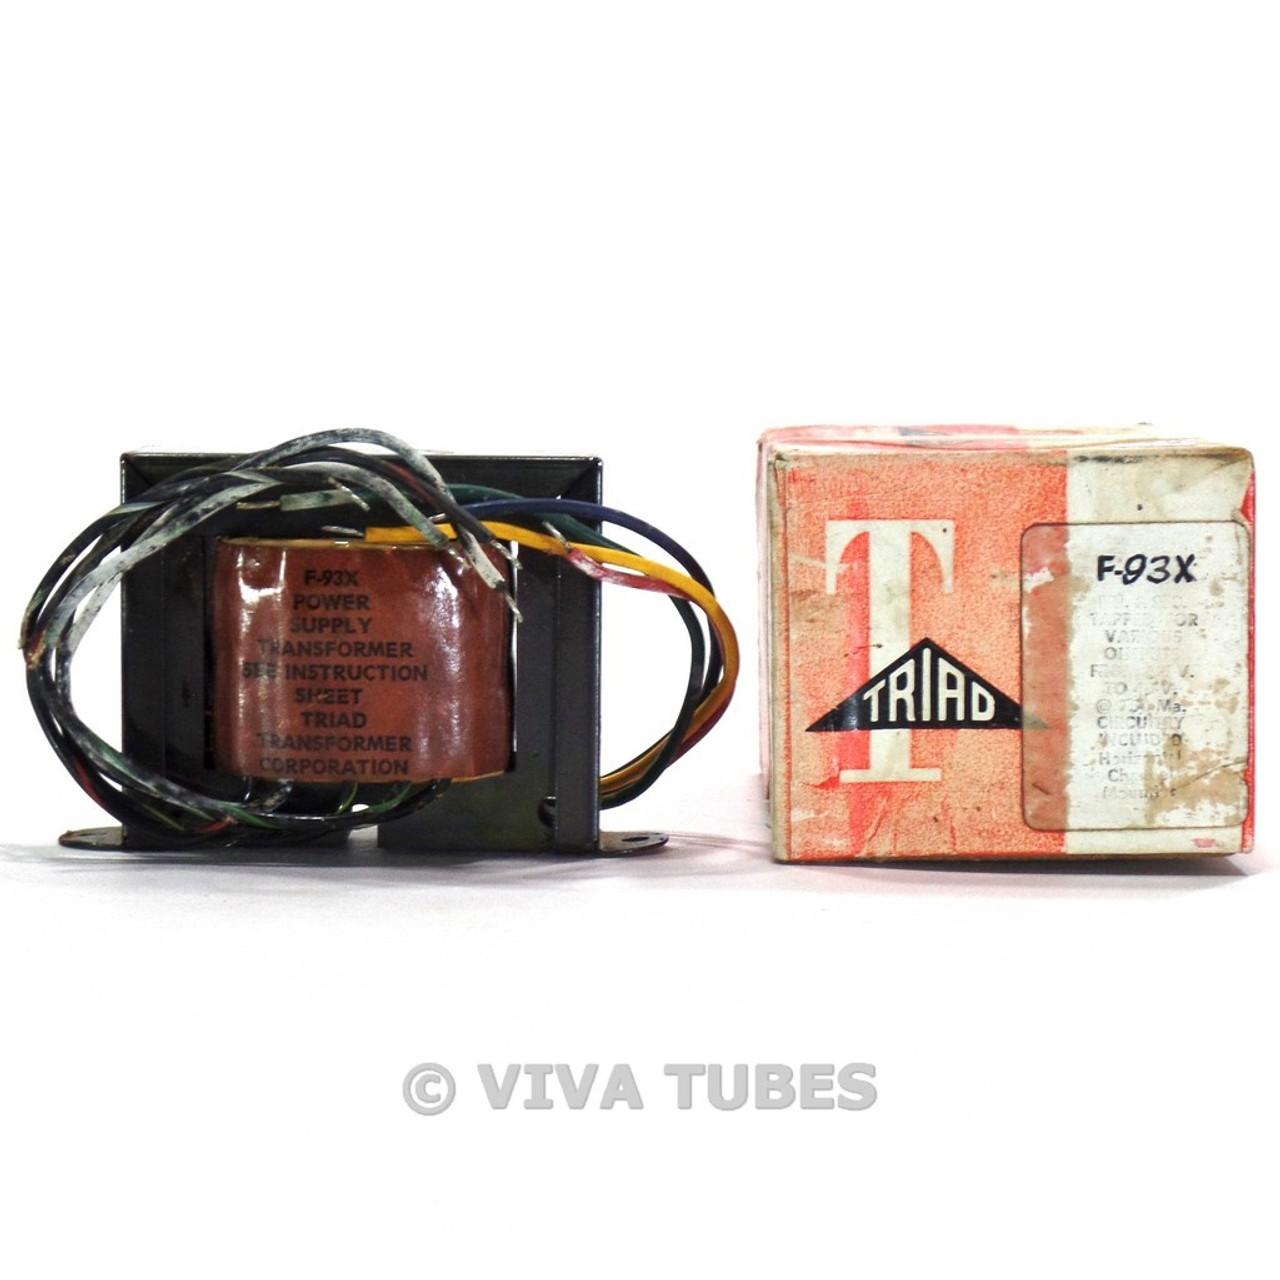 NOS//NIB Triad F-45X Filament Transformer 24VCT @ 1A Free Shipping